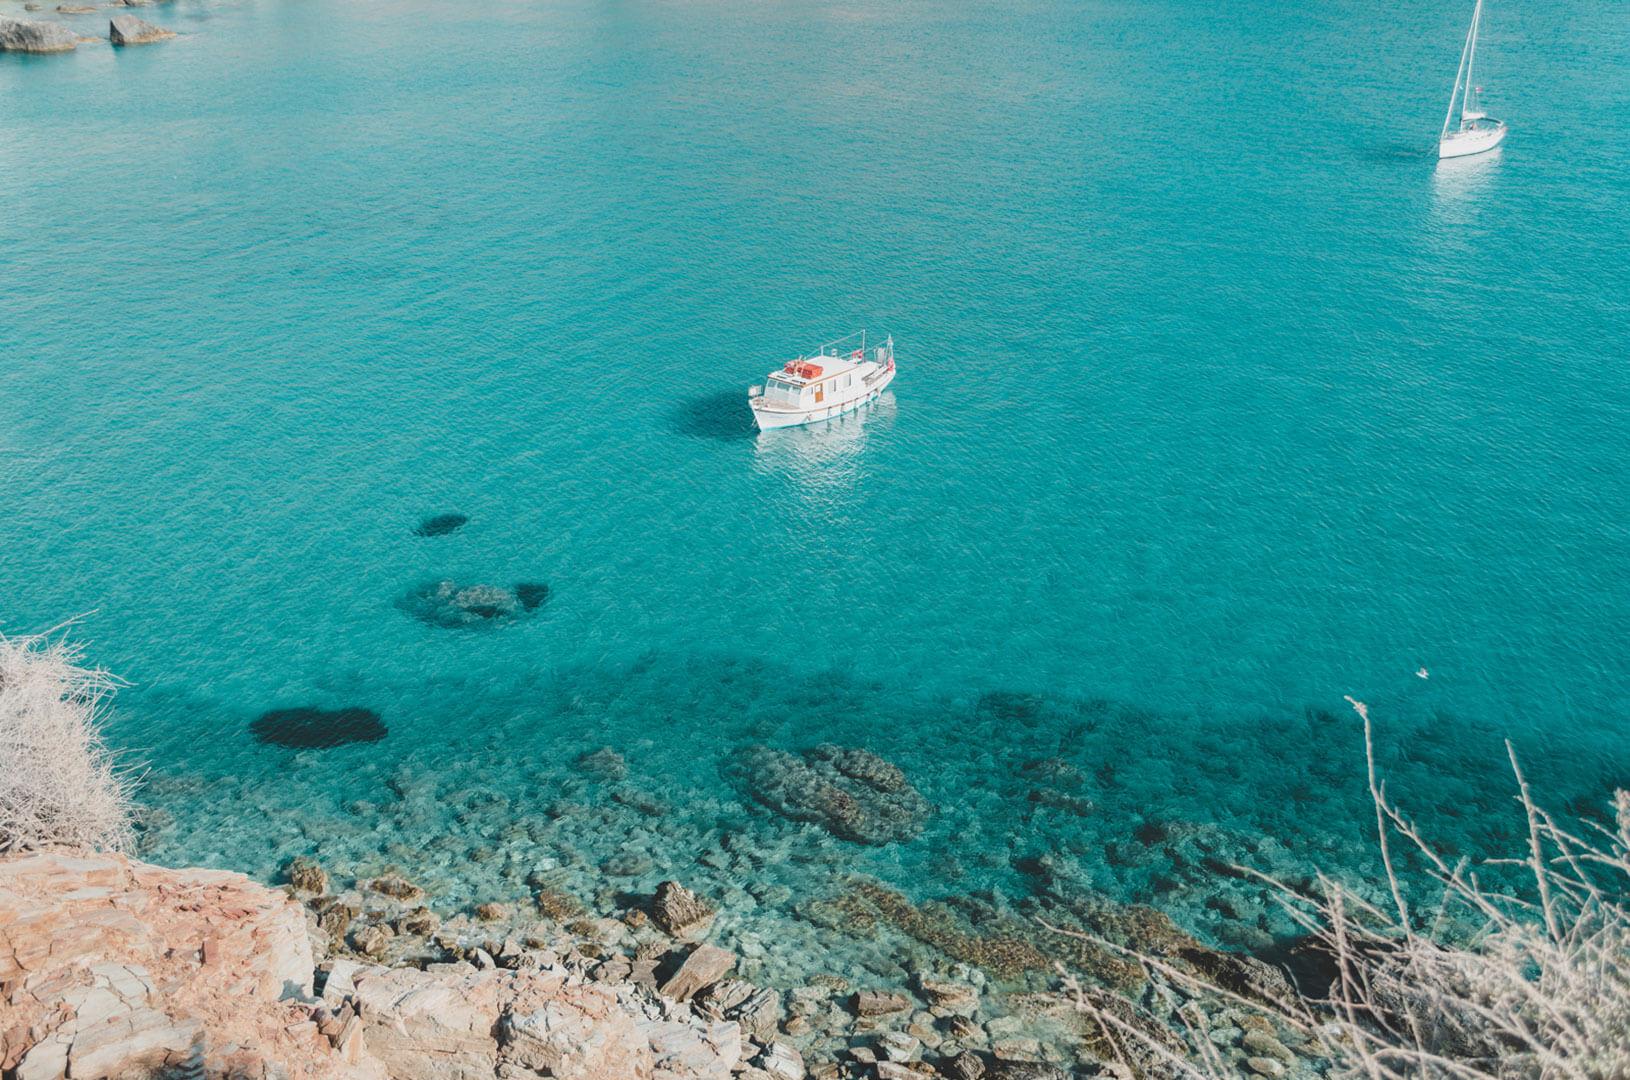 folegandros-cyclades-greece-la-vie-en-blog-all-rights-reserved-5